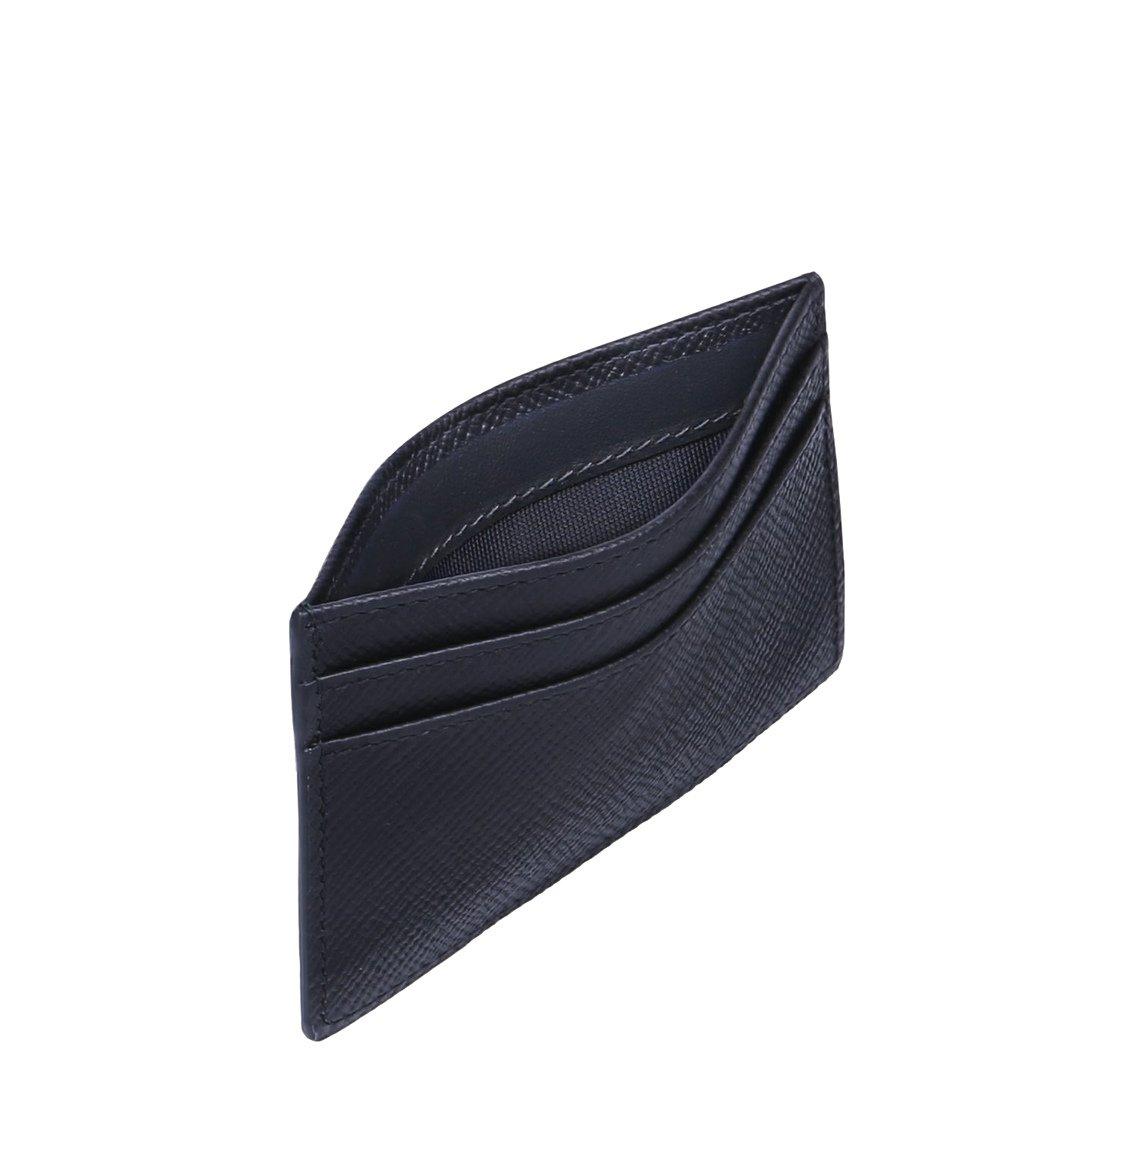 Smythson Panama Cross-Grain Leather Card Holder Navy